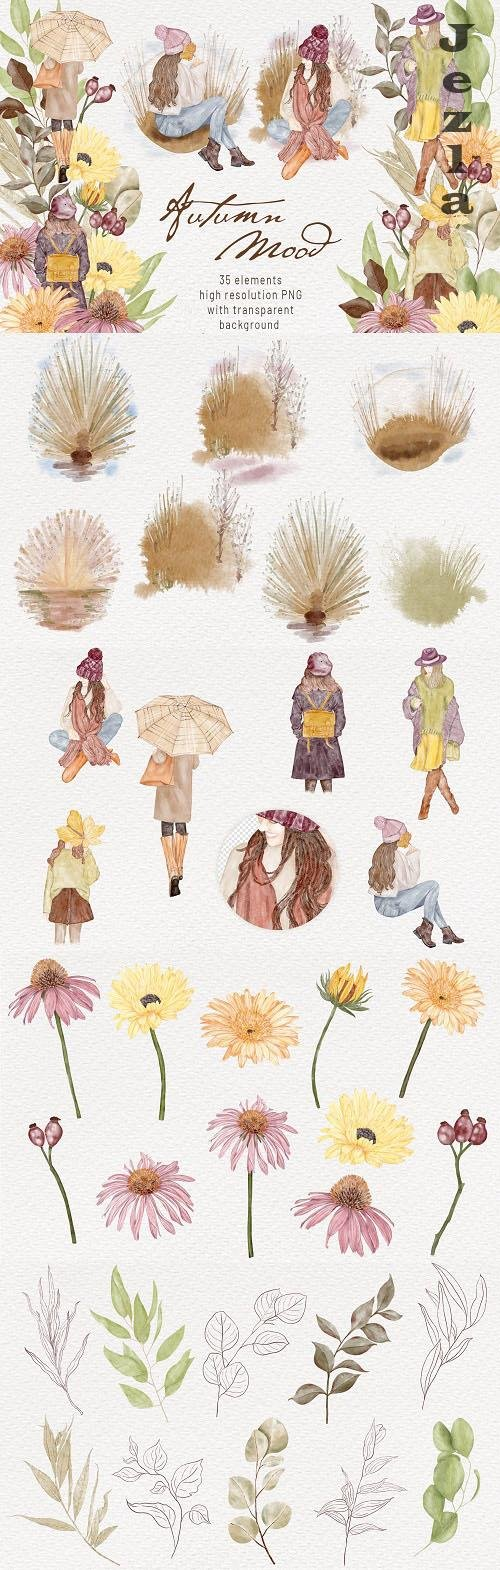 Autumn Girls Watercolor Clipart Boho Autumn Mood - 1485040